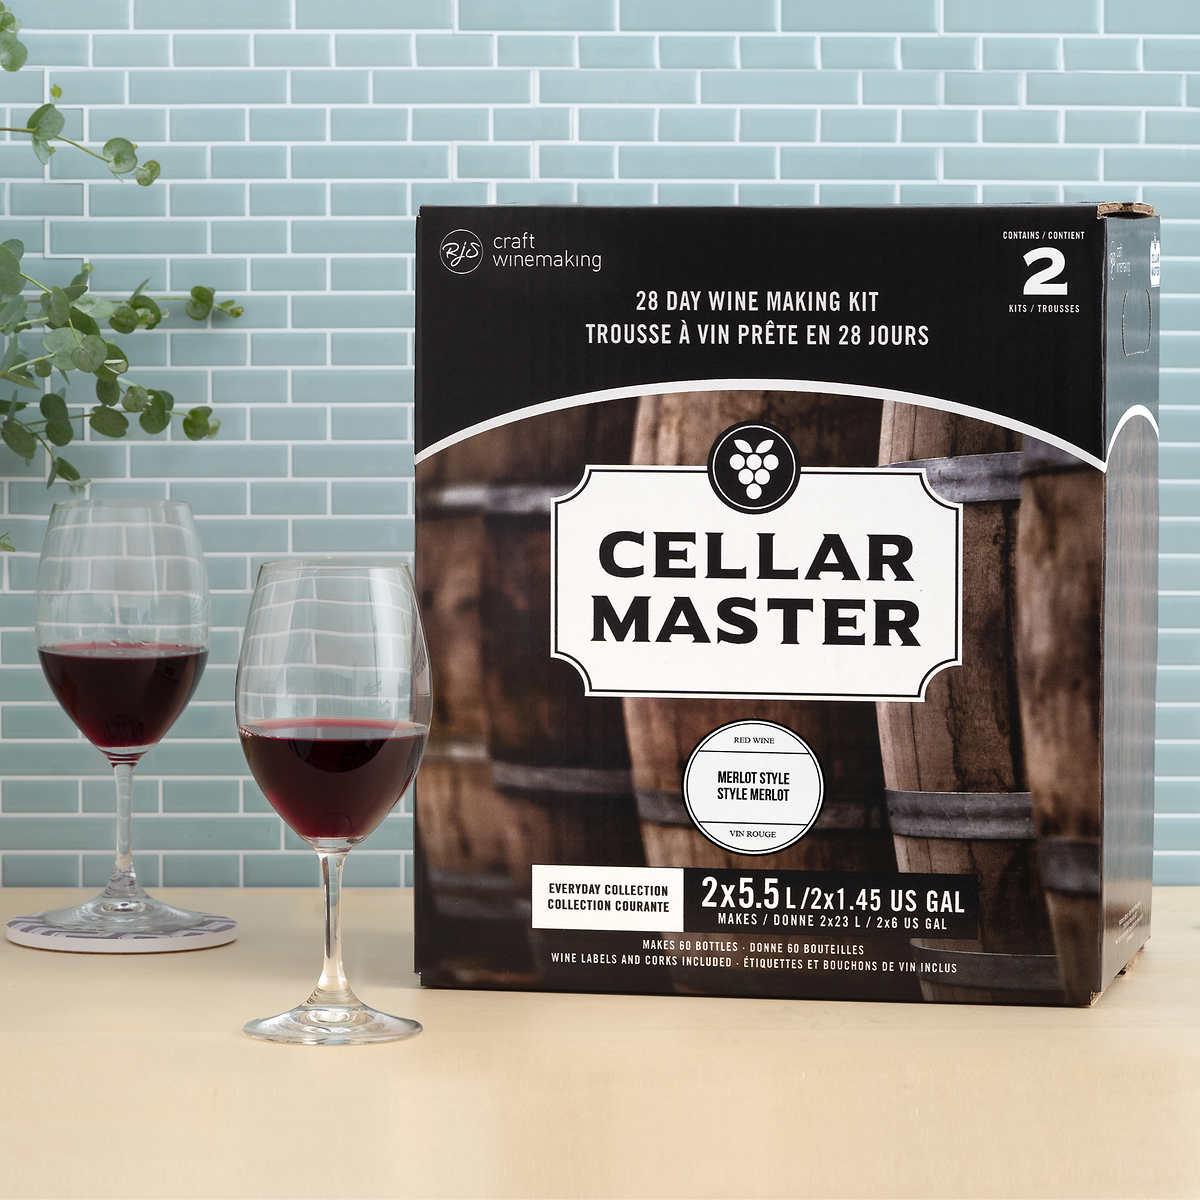 Cellar craft wine kits - Cellar Master Cabernet Sauvignon